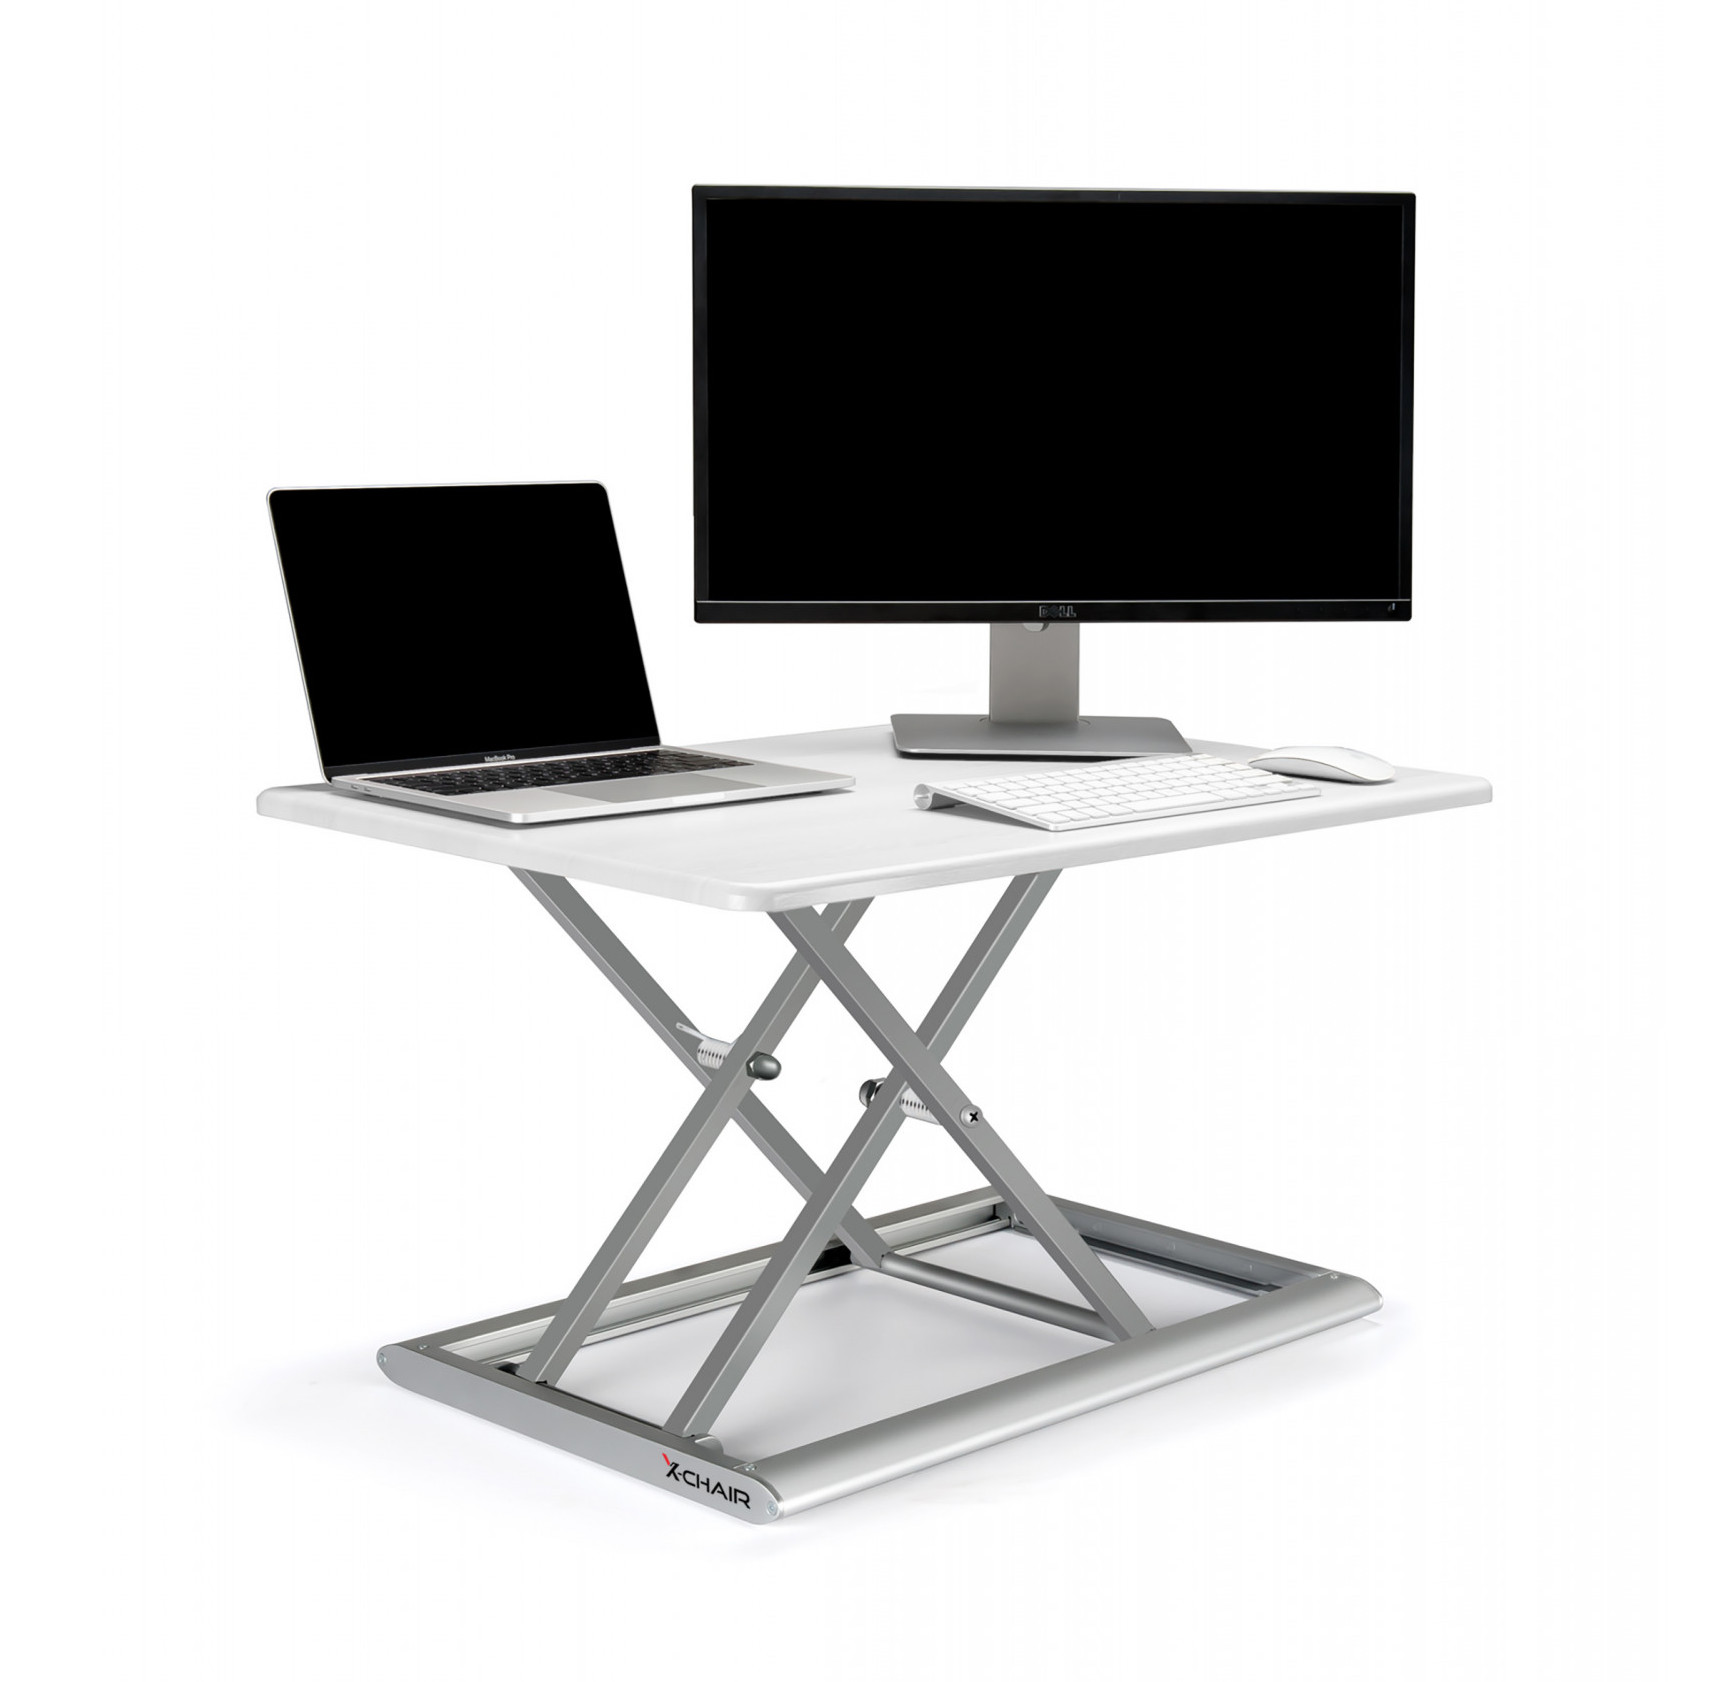 x-flextop portable sit to stand desk